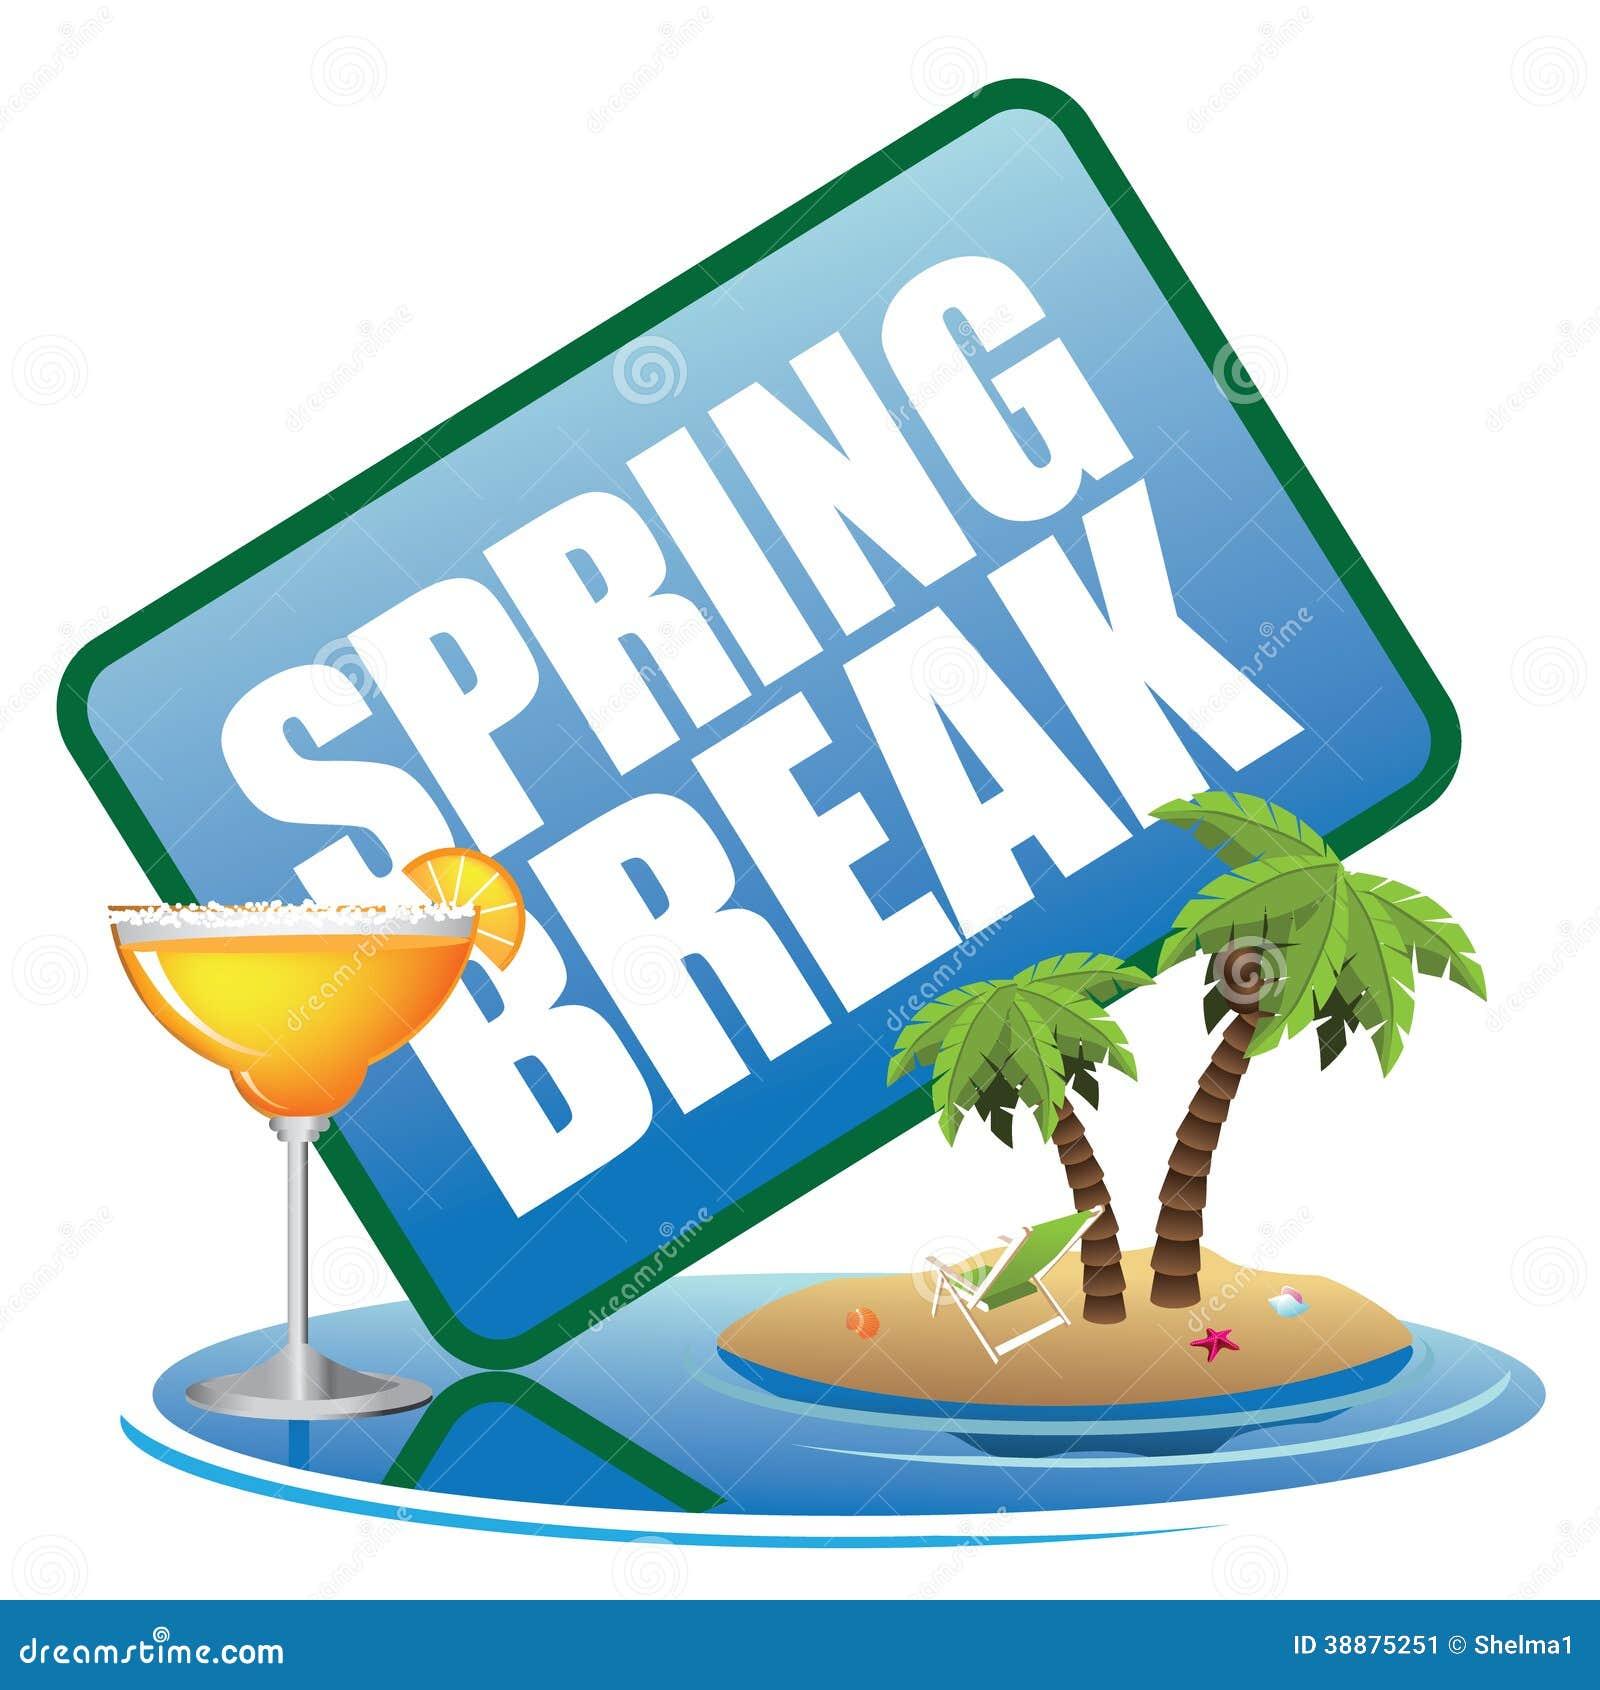 Spring break icon stock illustration. Illustration of clip ...